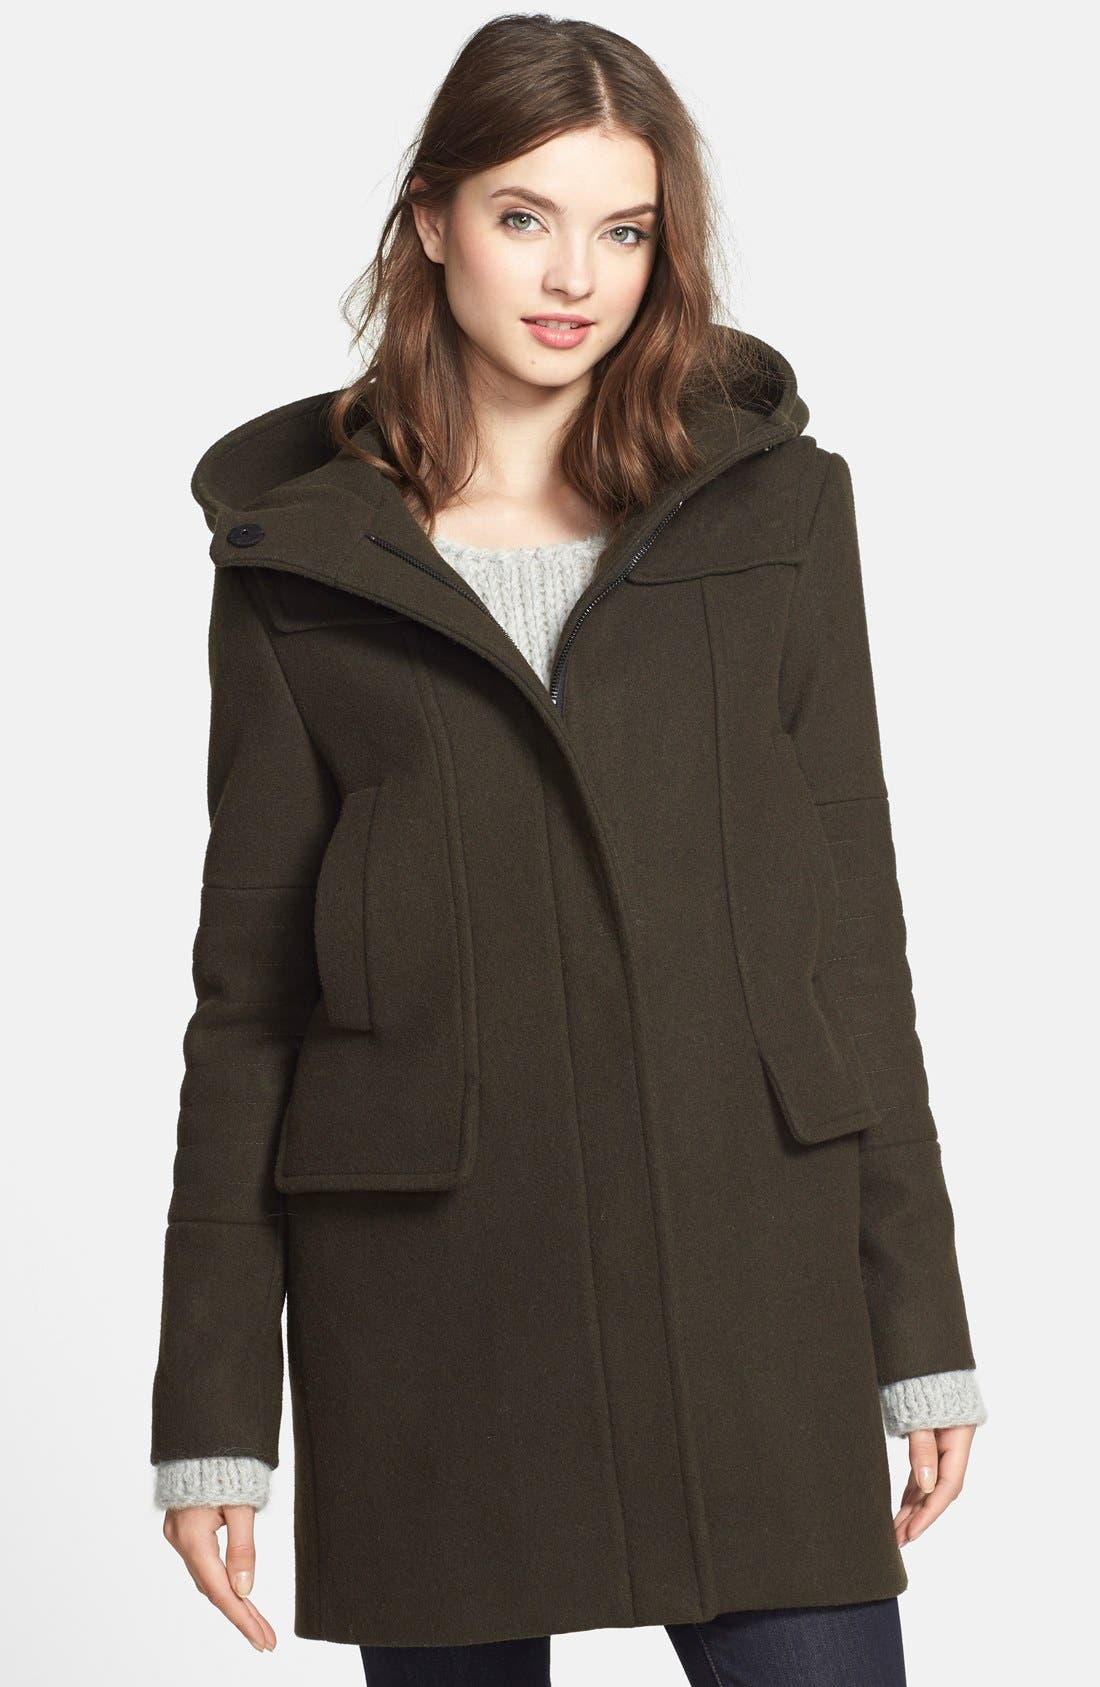 Alternate Image 1 Selected - Vince Camuto Wool Blend Duffle Coat